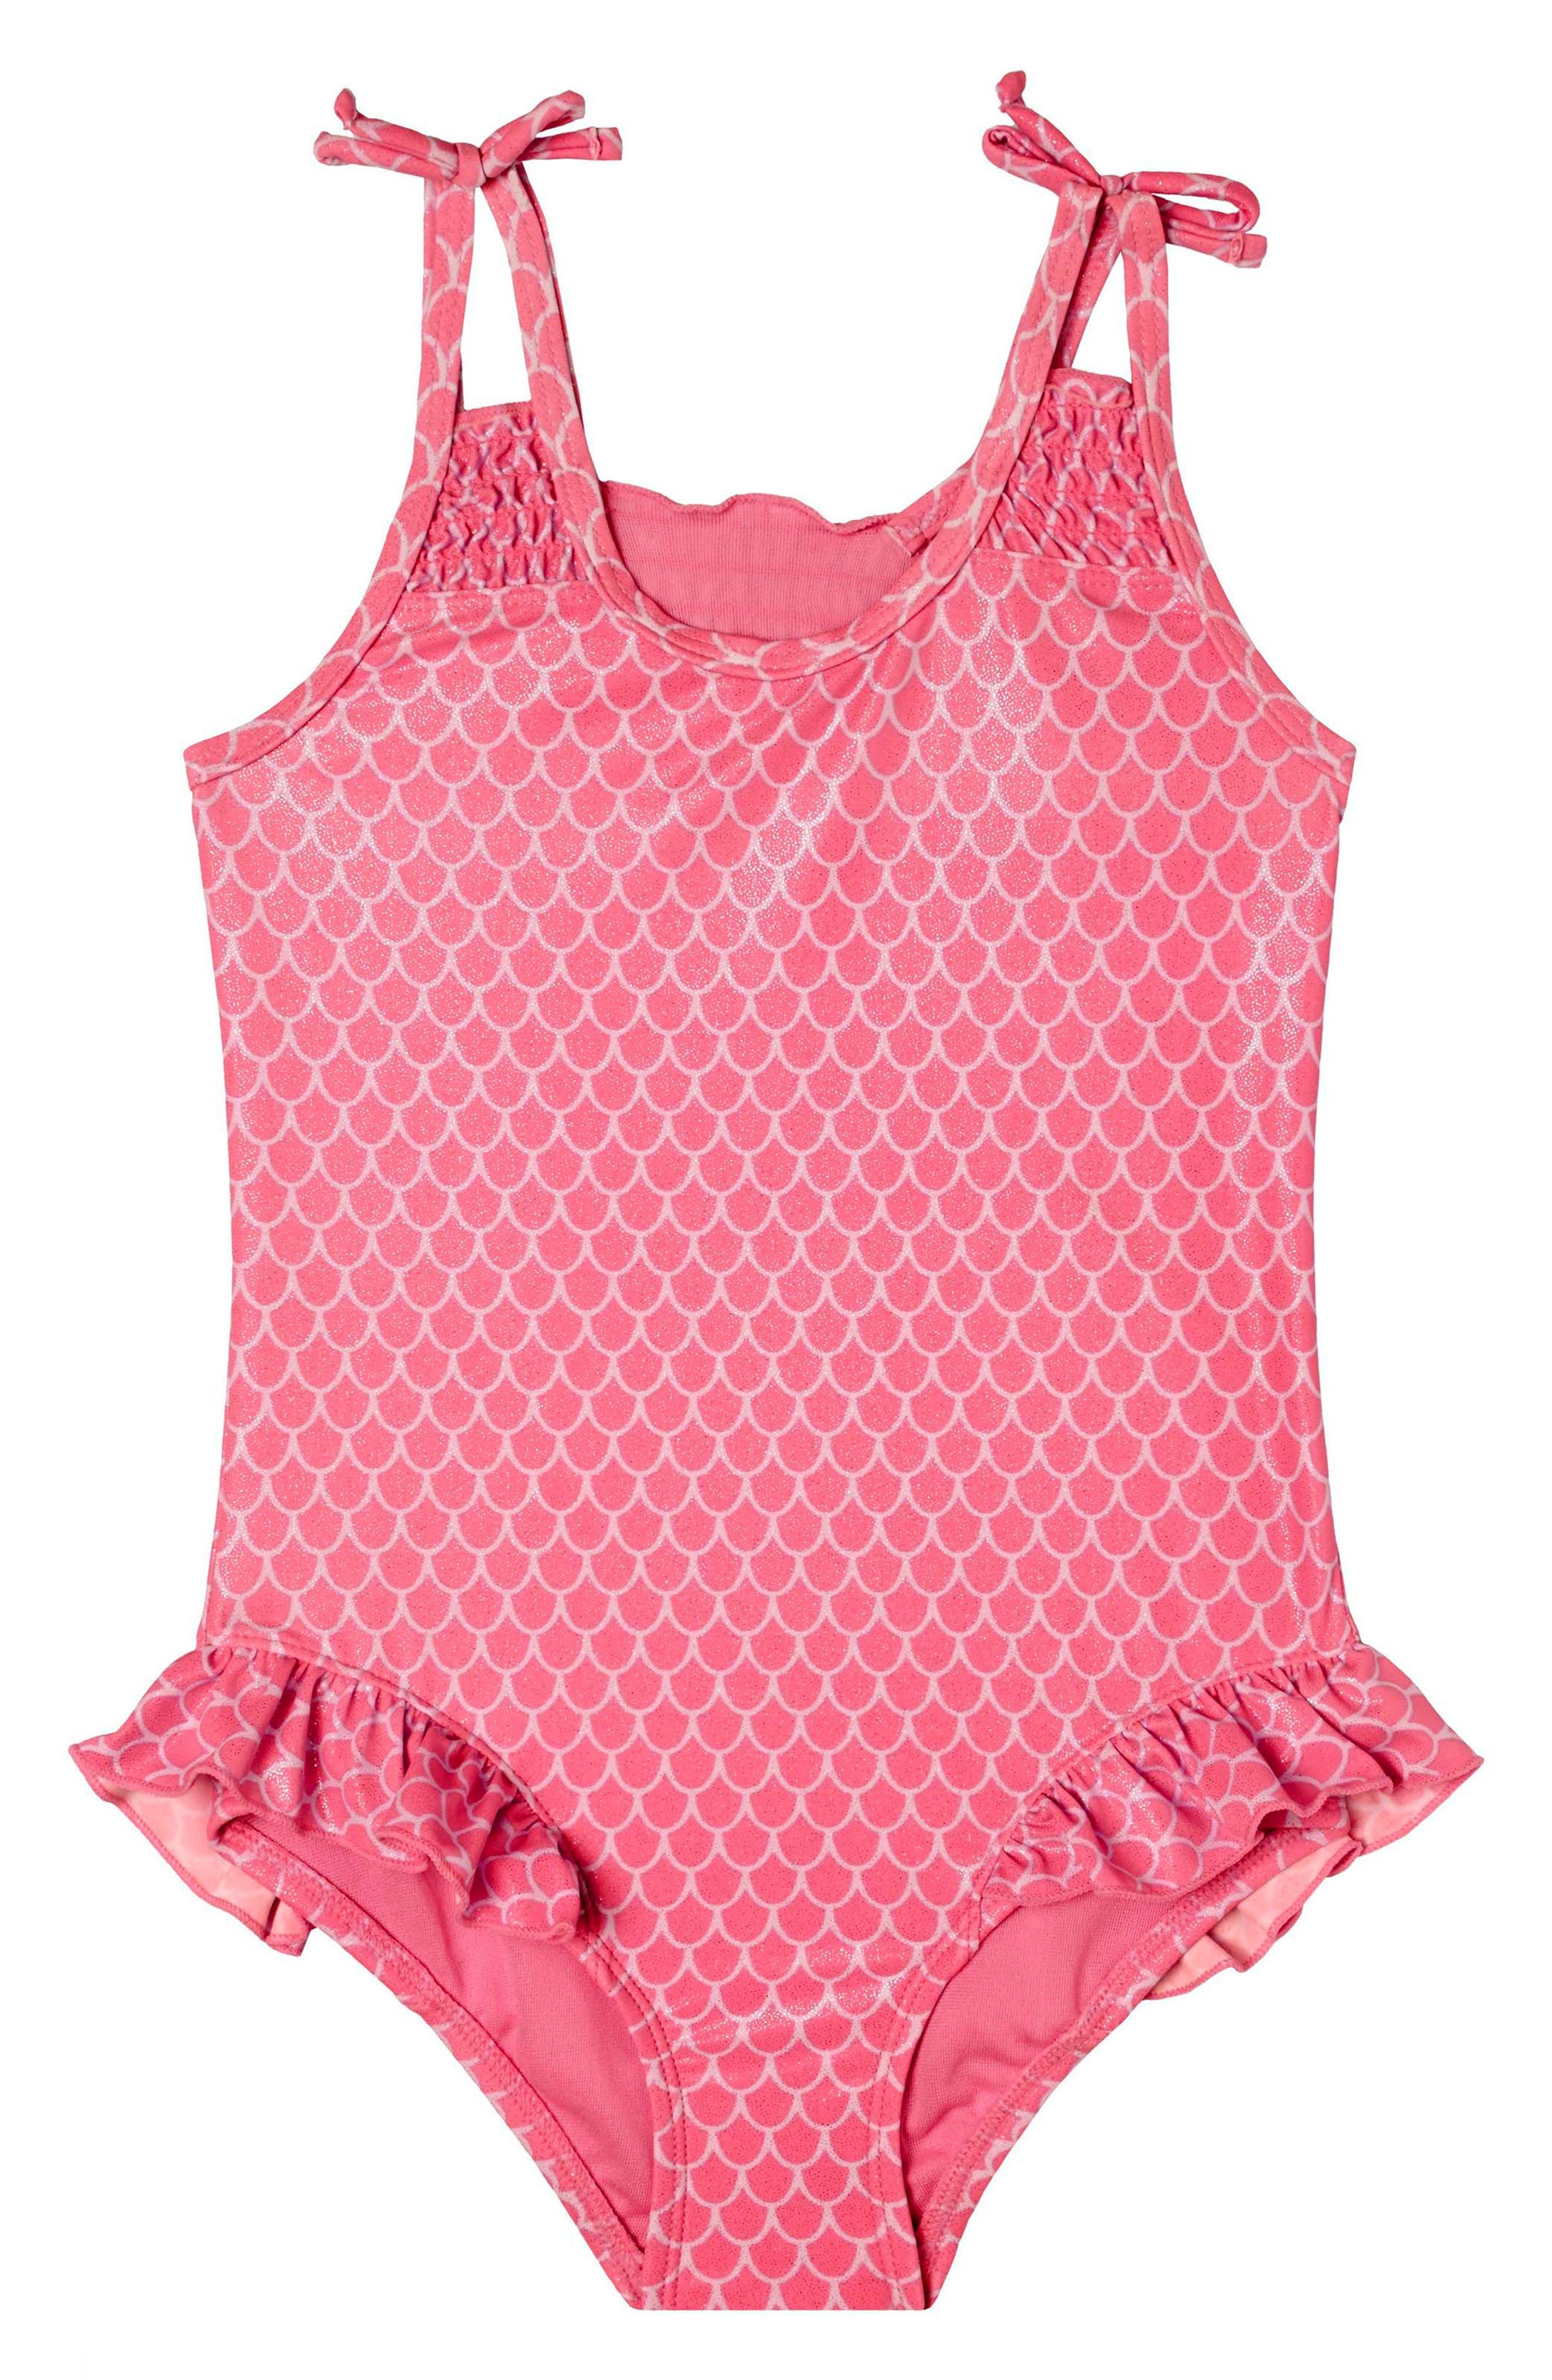 Mermaid Princess One-Piece Swimsuit,                         Main,                         color, Pink